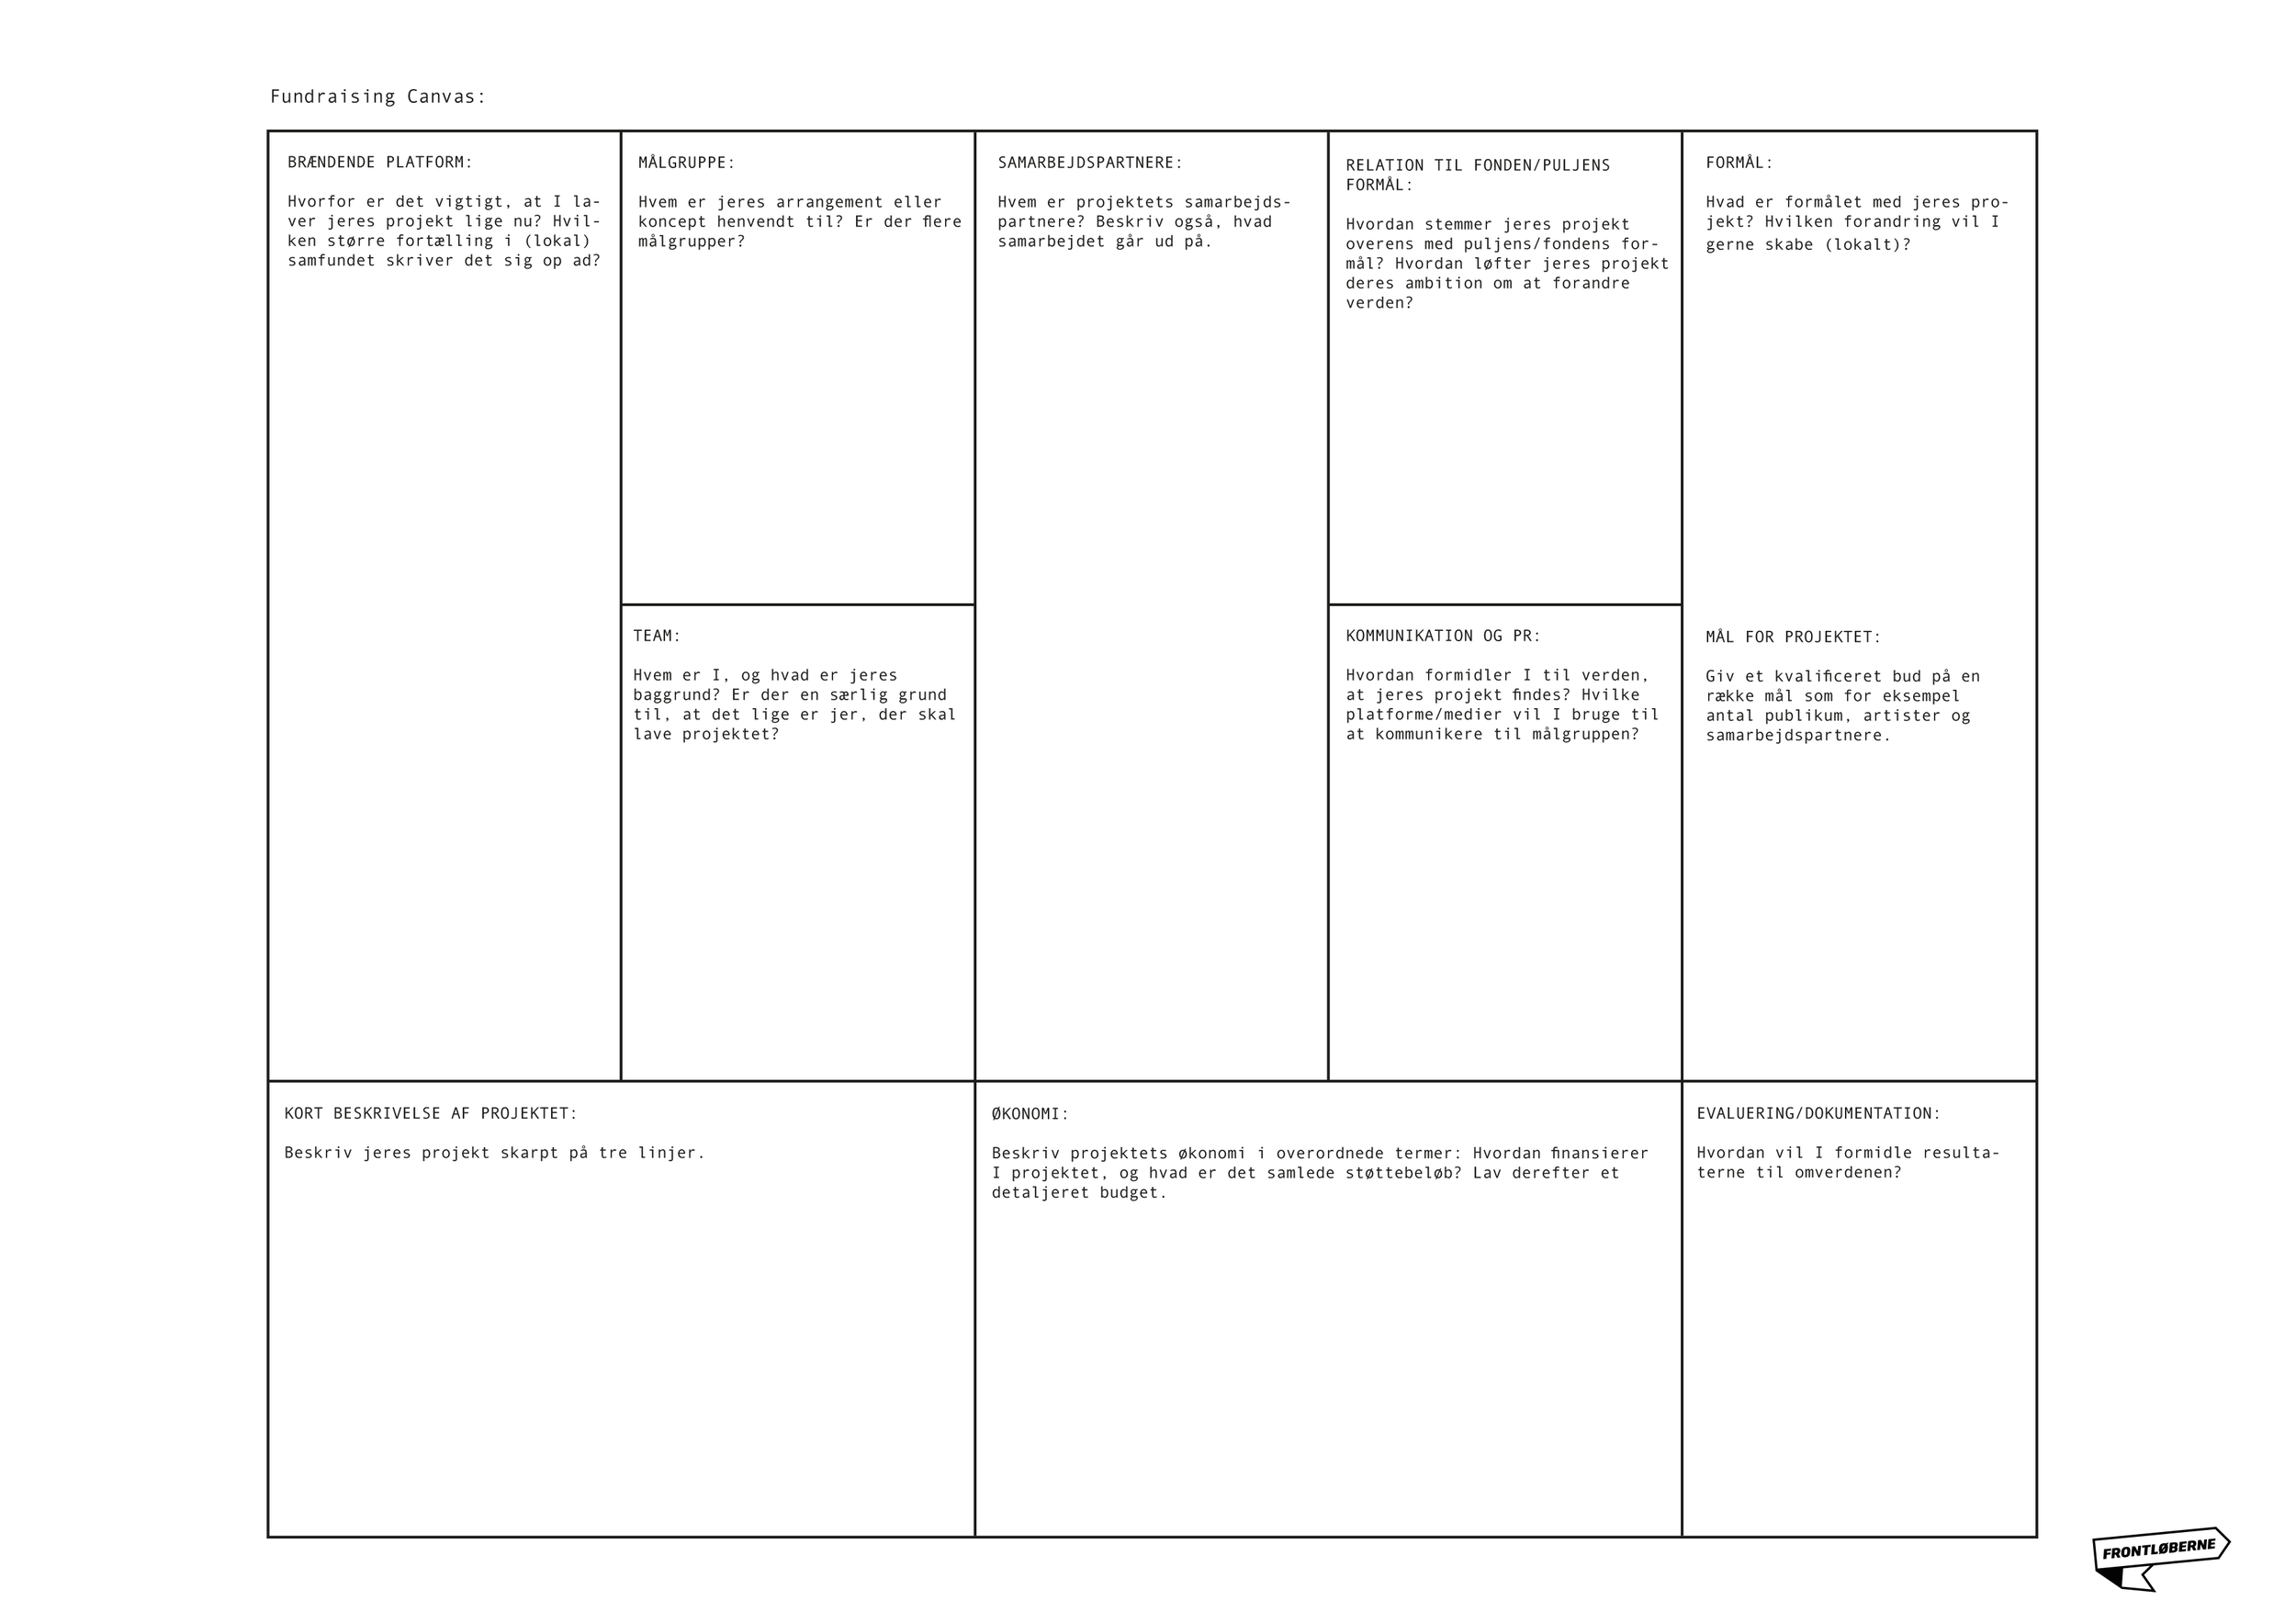 fundraising canvas layoutet kopi.png